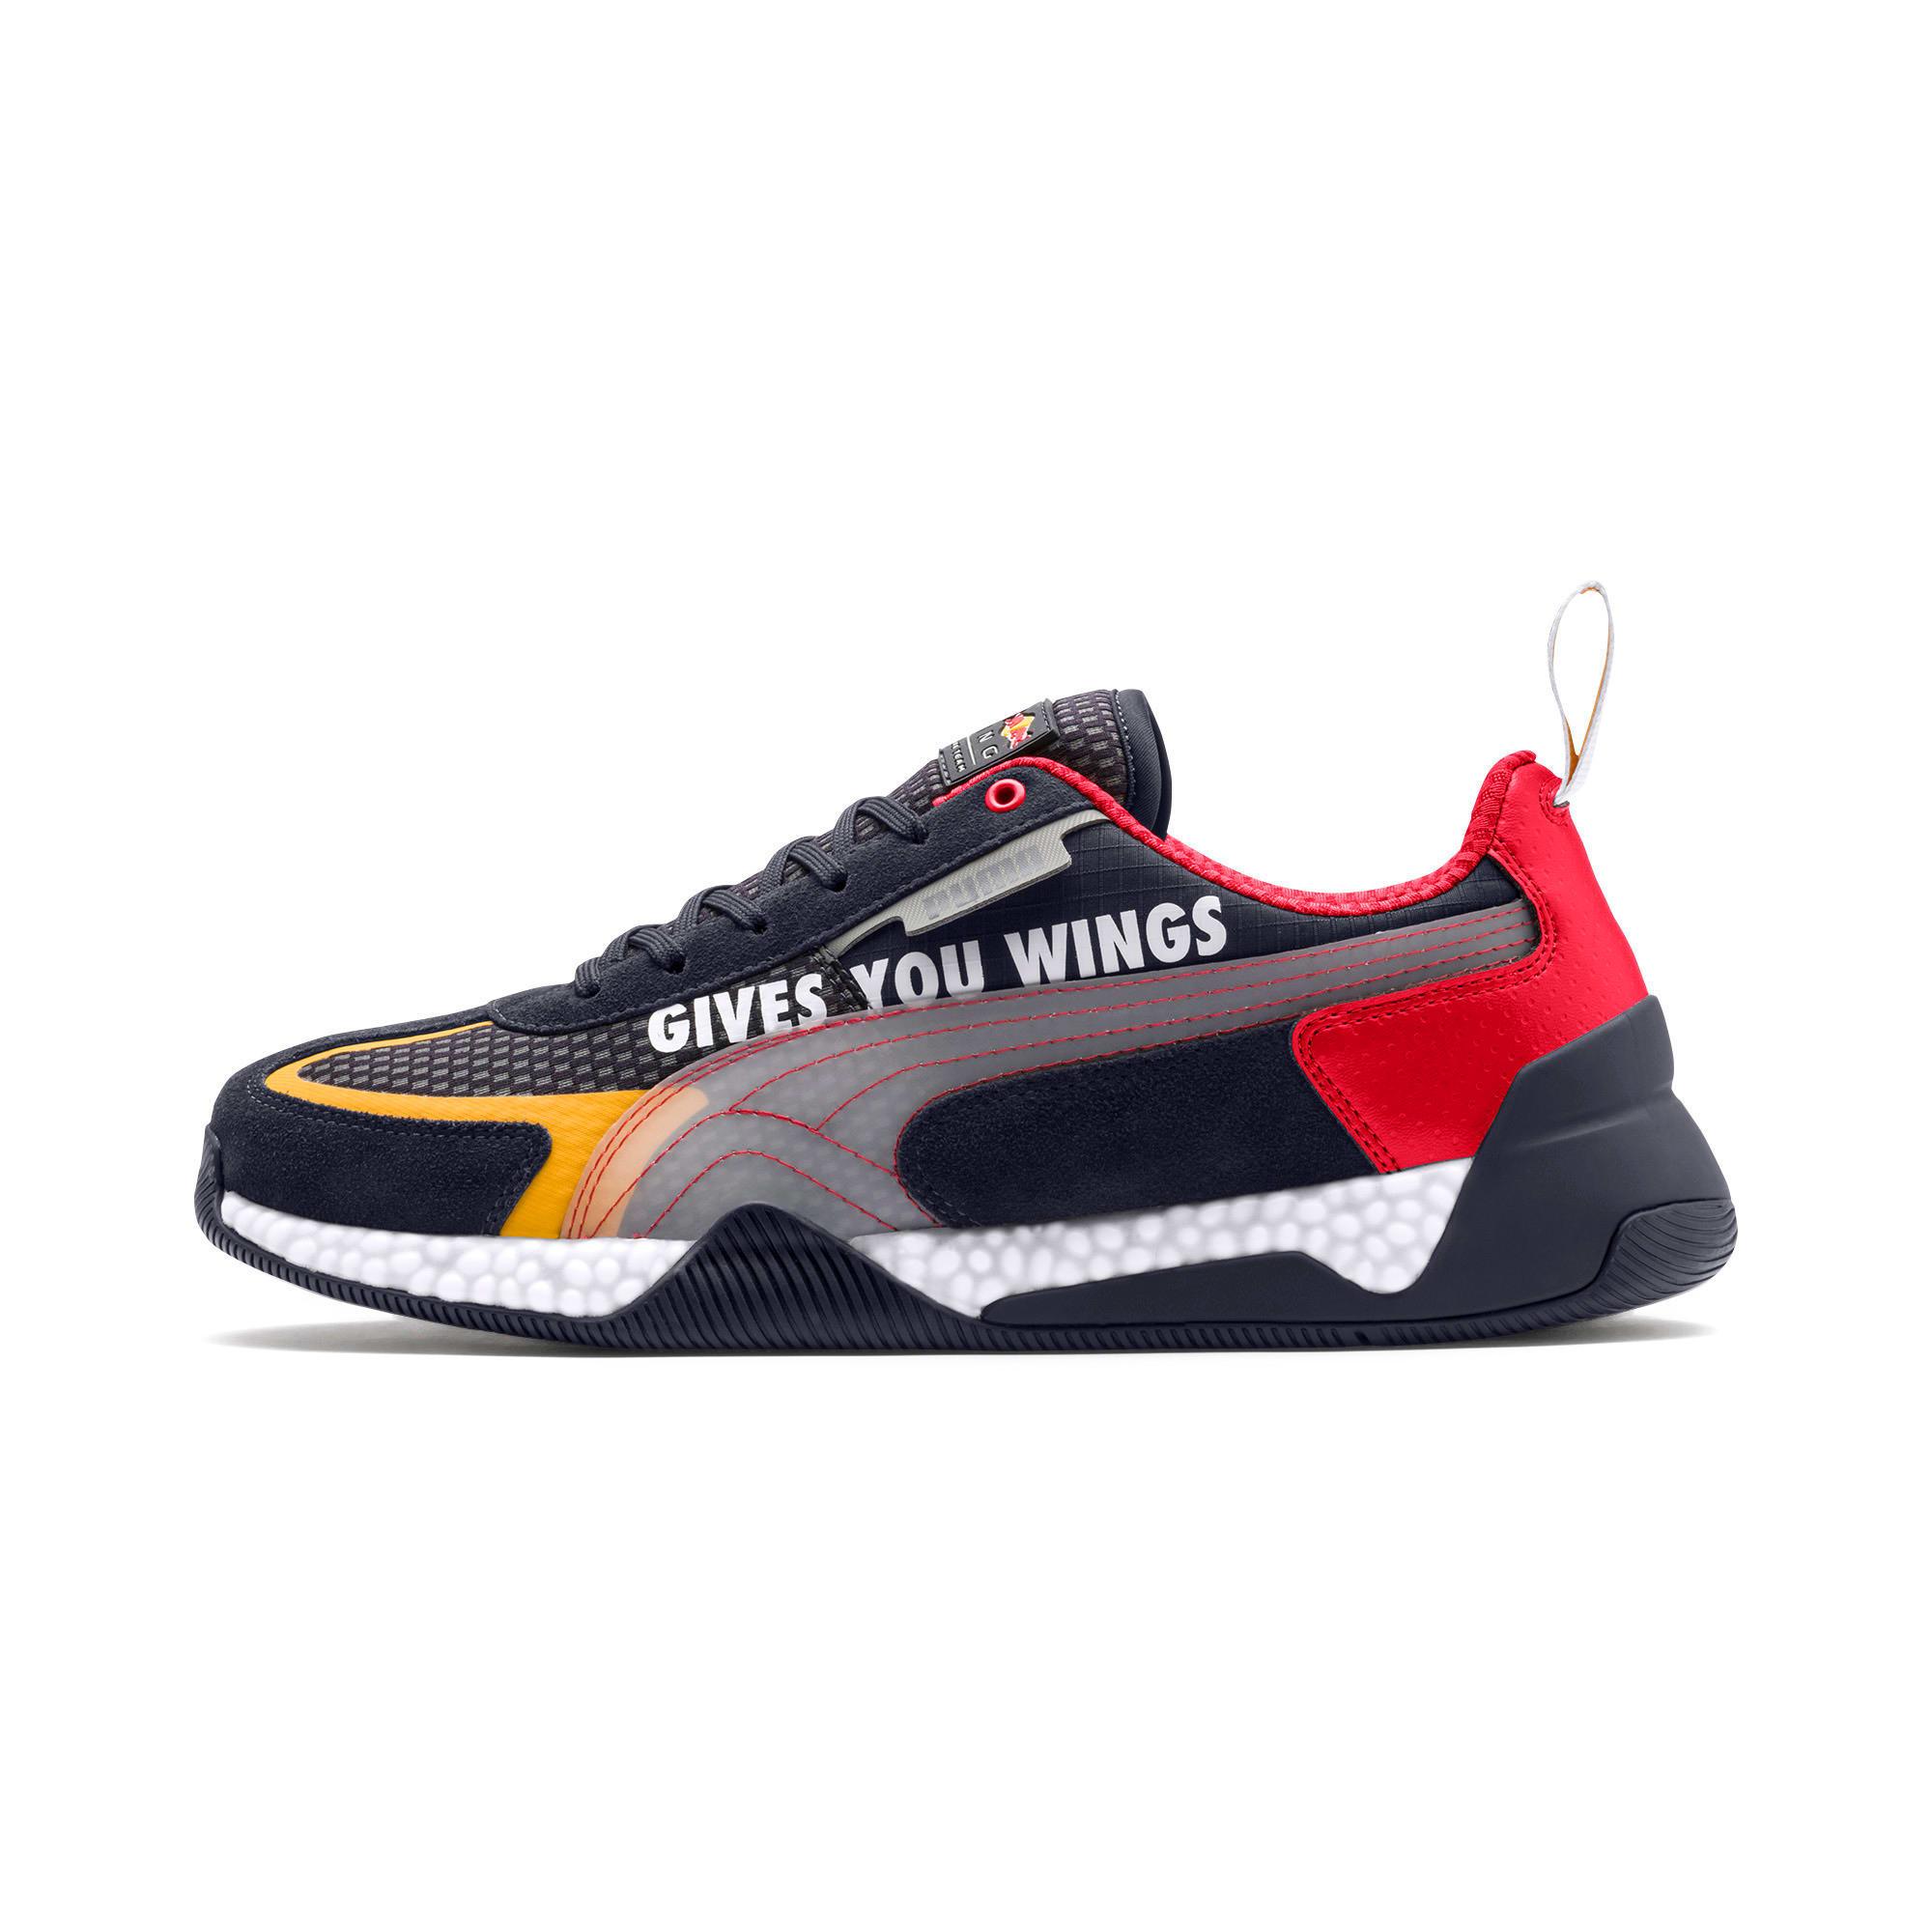 Thumbnail 1 of Red Bull Racing Speed HYBRID sneakers voor heren, NIGHT SKY-White-Chinese Red, medium